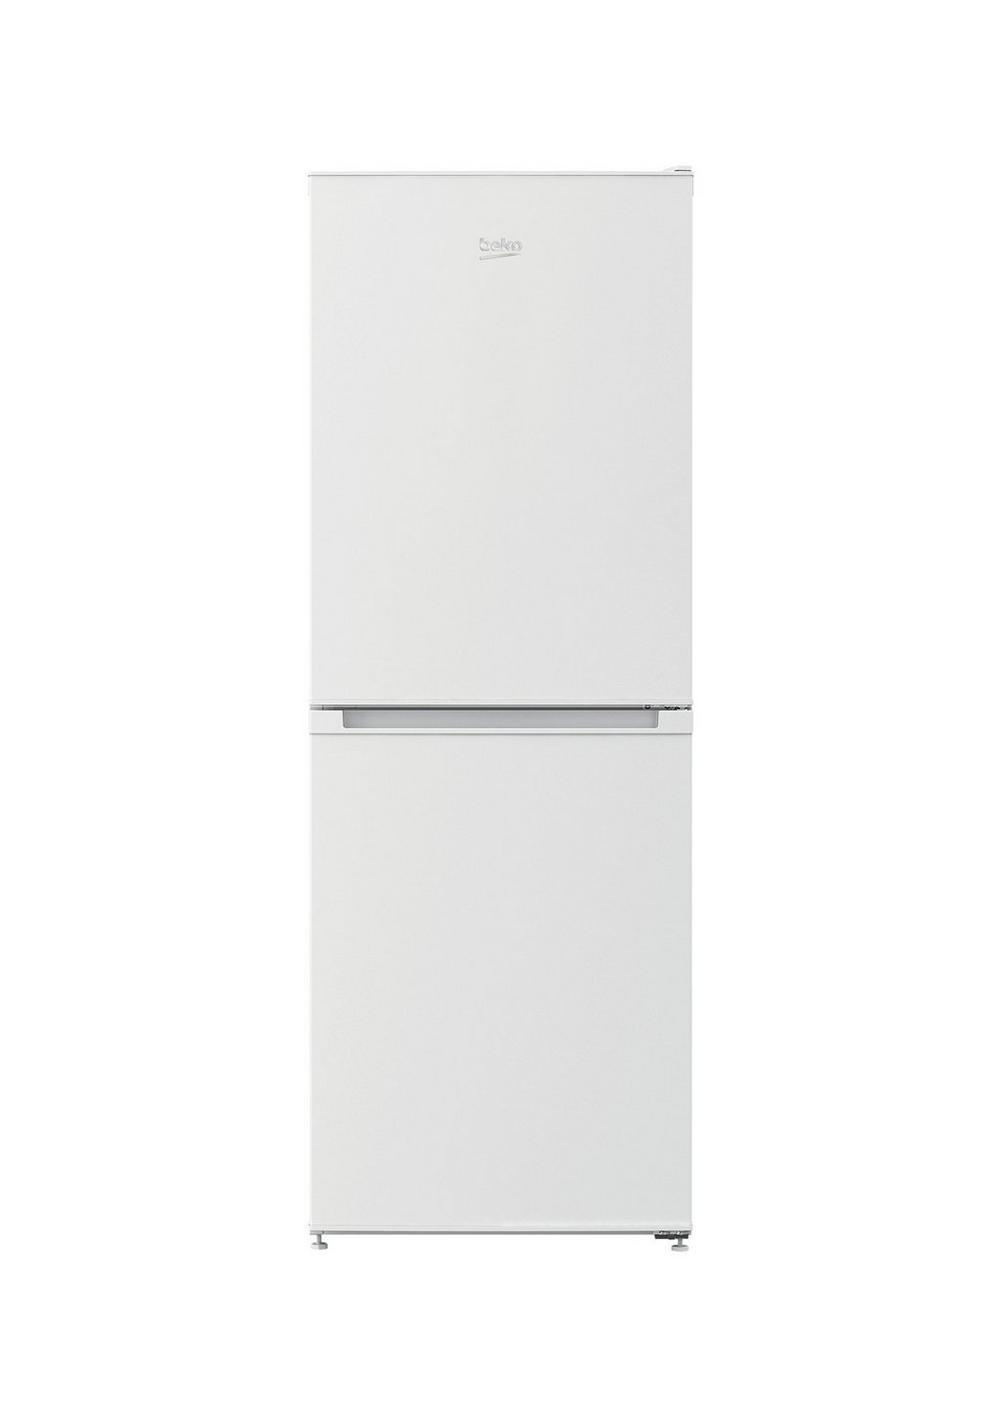 Beko Ccfm3552w Frost Free Fridge Freezer White A